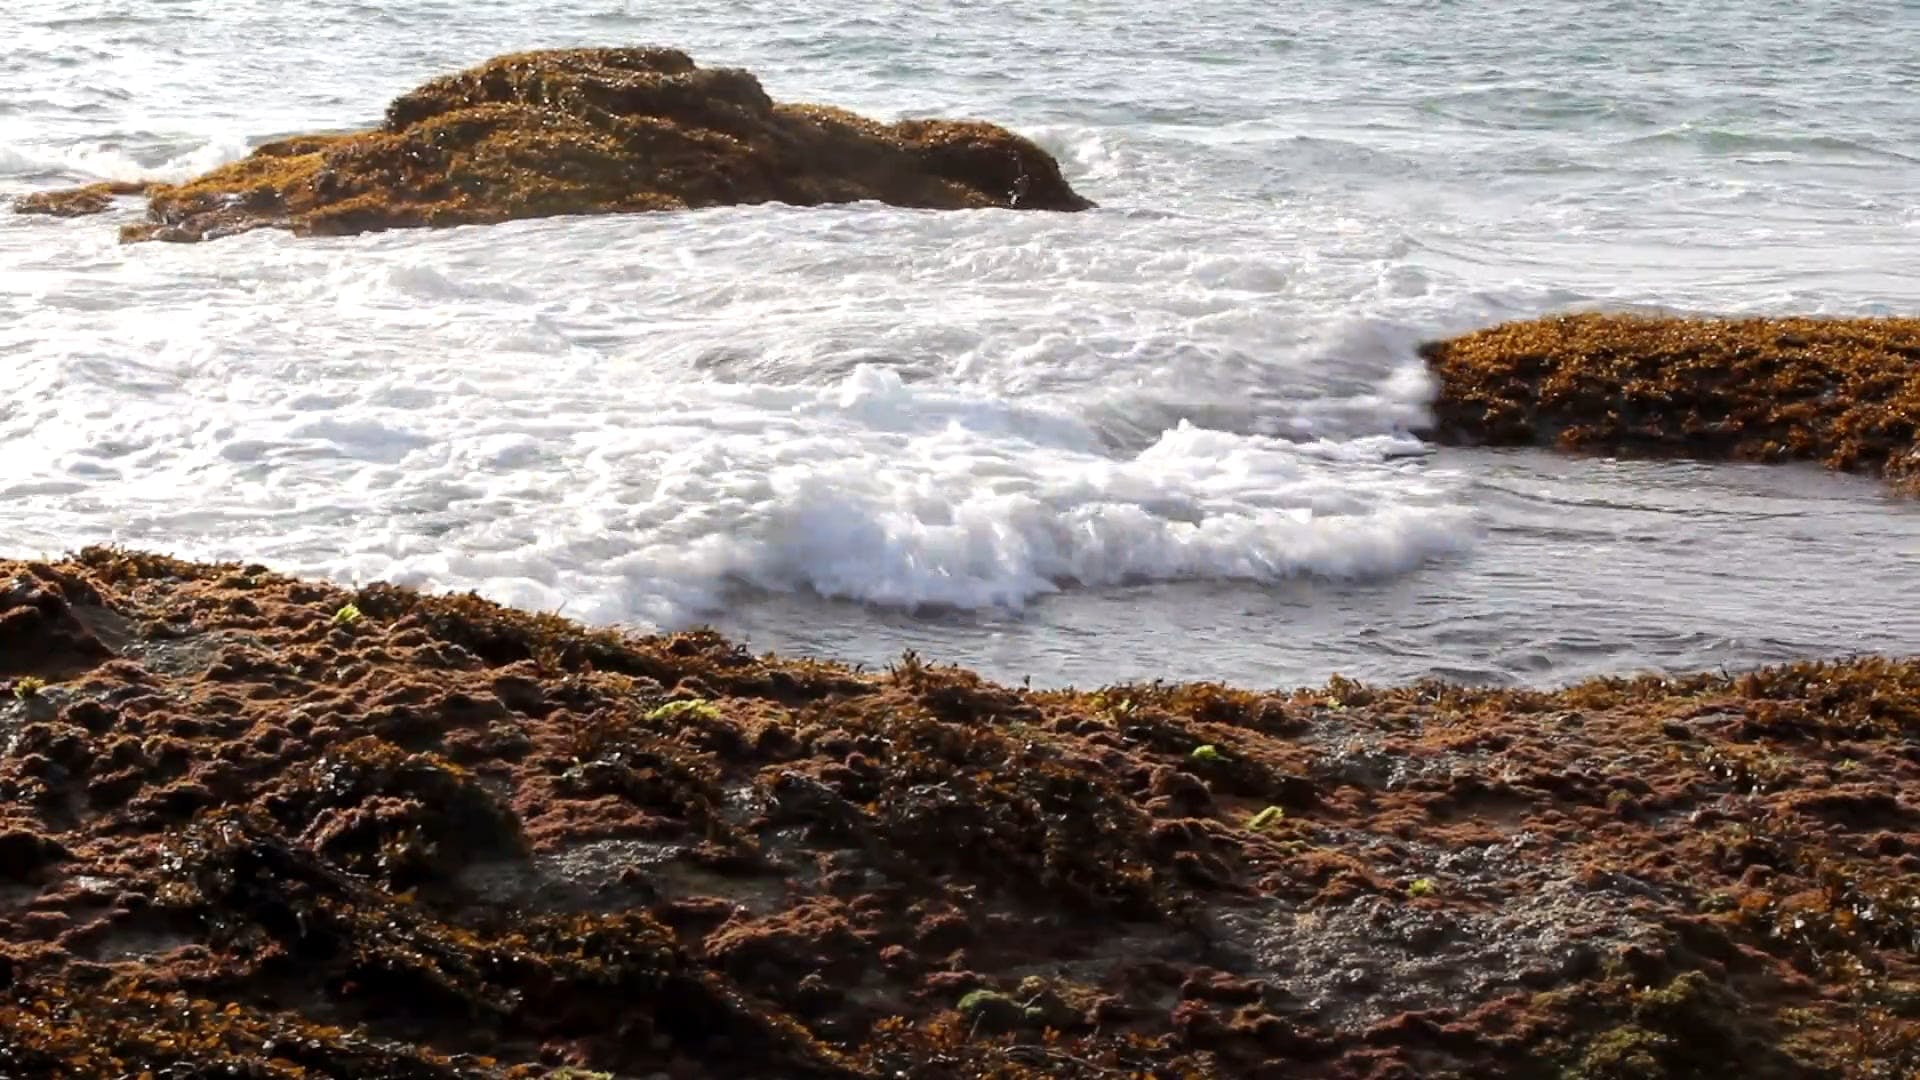 Waves Crashing On Rocks On Seashore